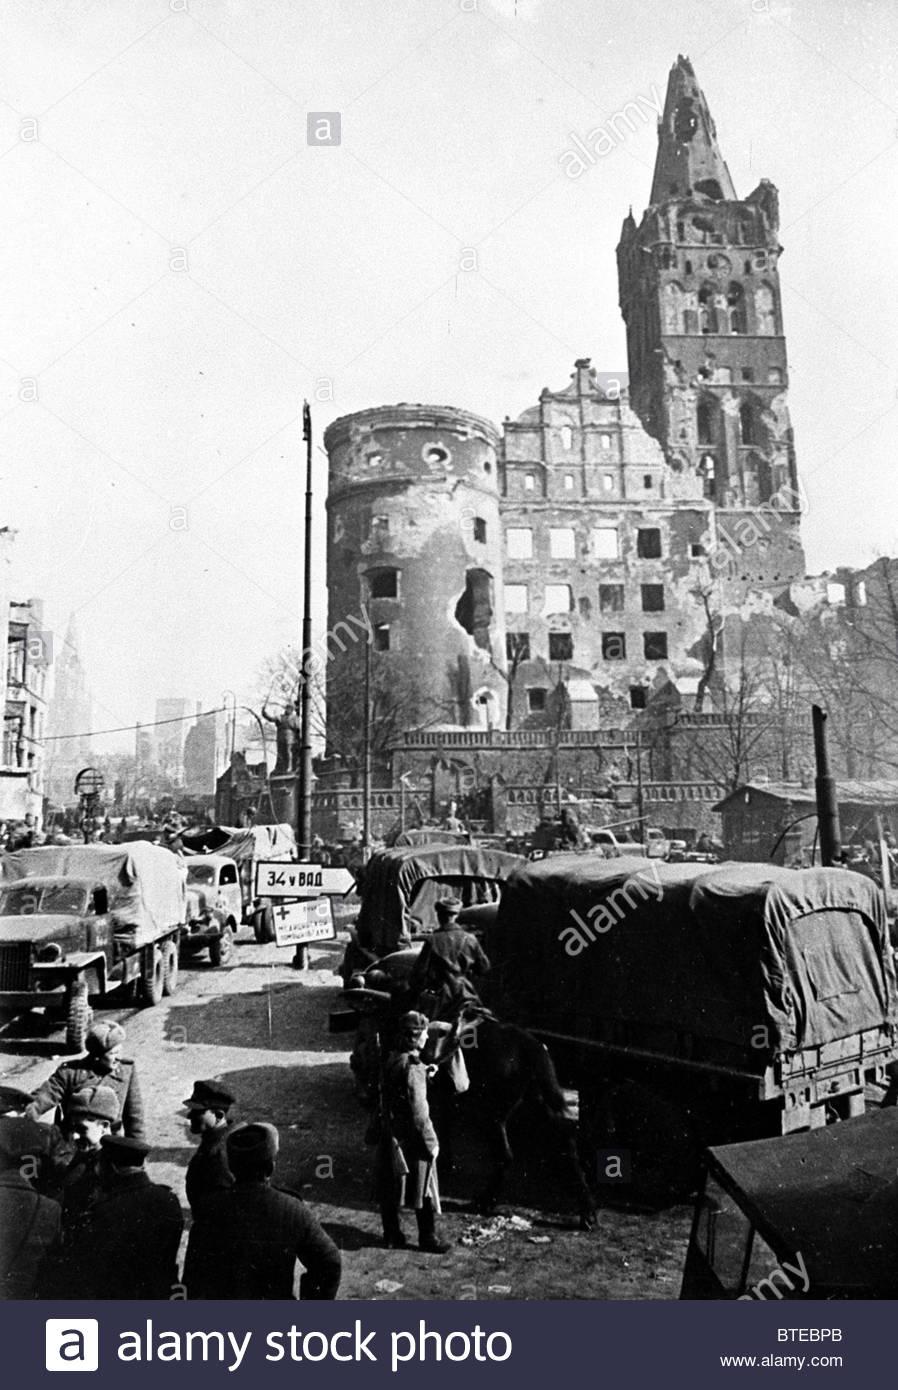 Great Patriotic War. Soviet Army in occupied Koenigsberg, 1945 - Stock Image